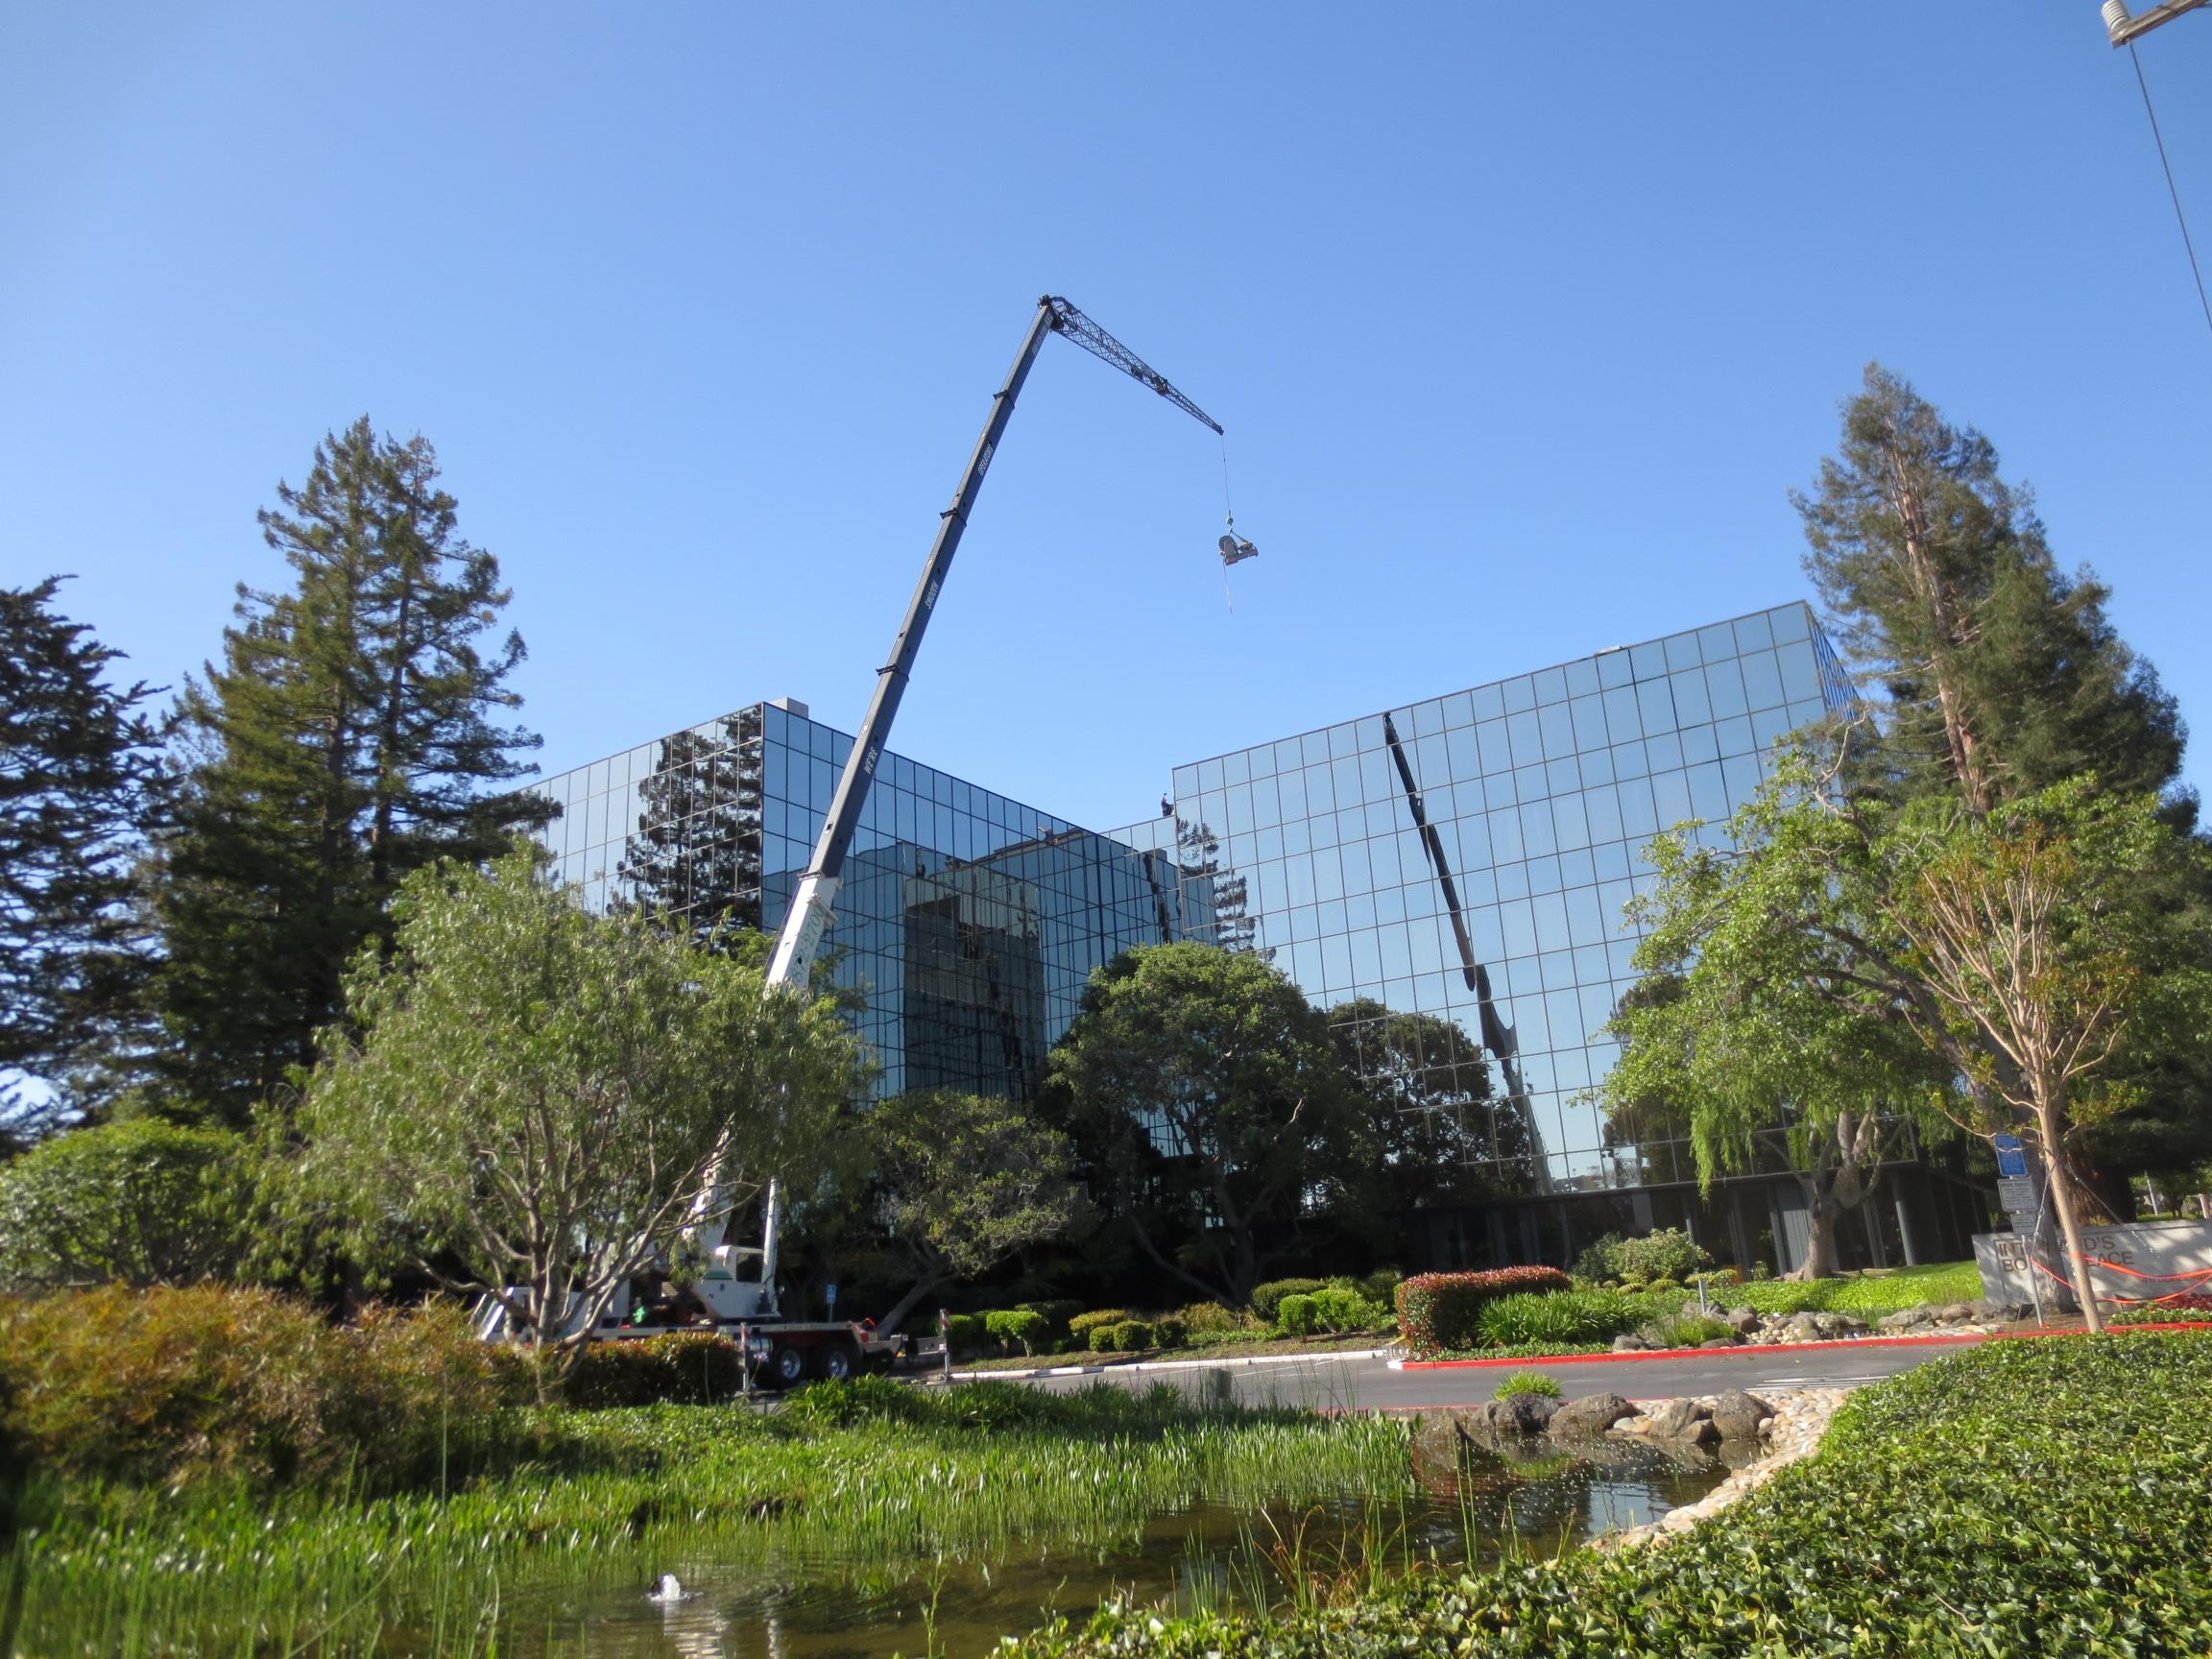 SM Modernization - crane pick.jpg